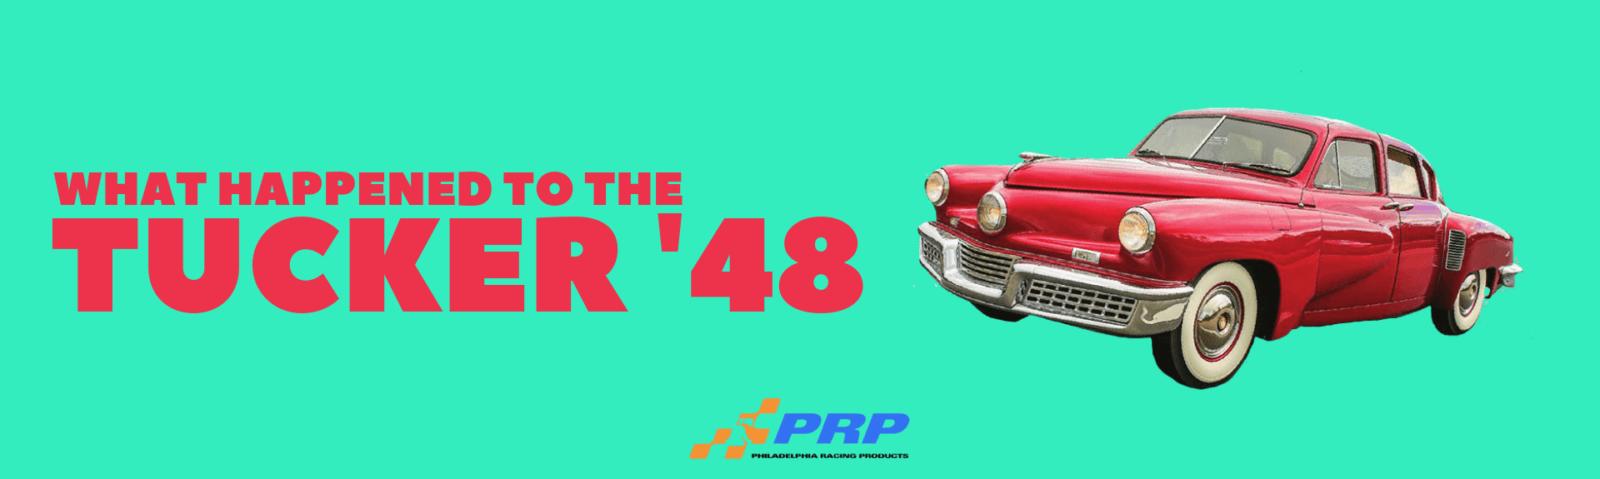 tucker 48 Preston Tucker automobile PRP Racing Products what happened to the tucker 48 philadelphia